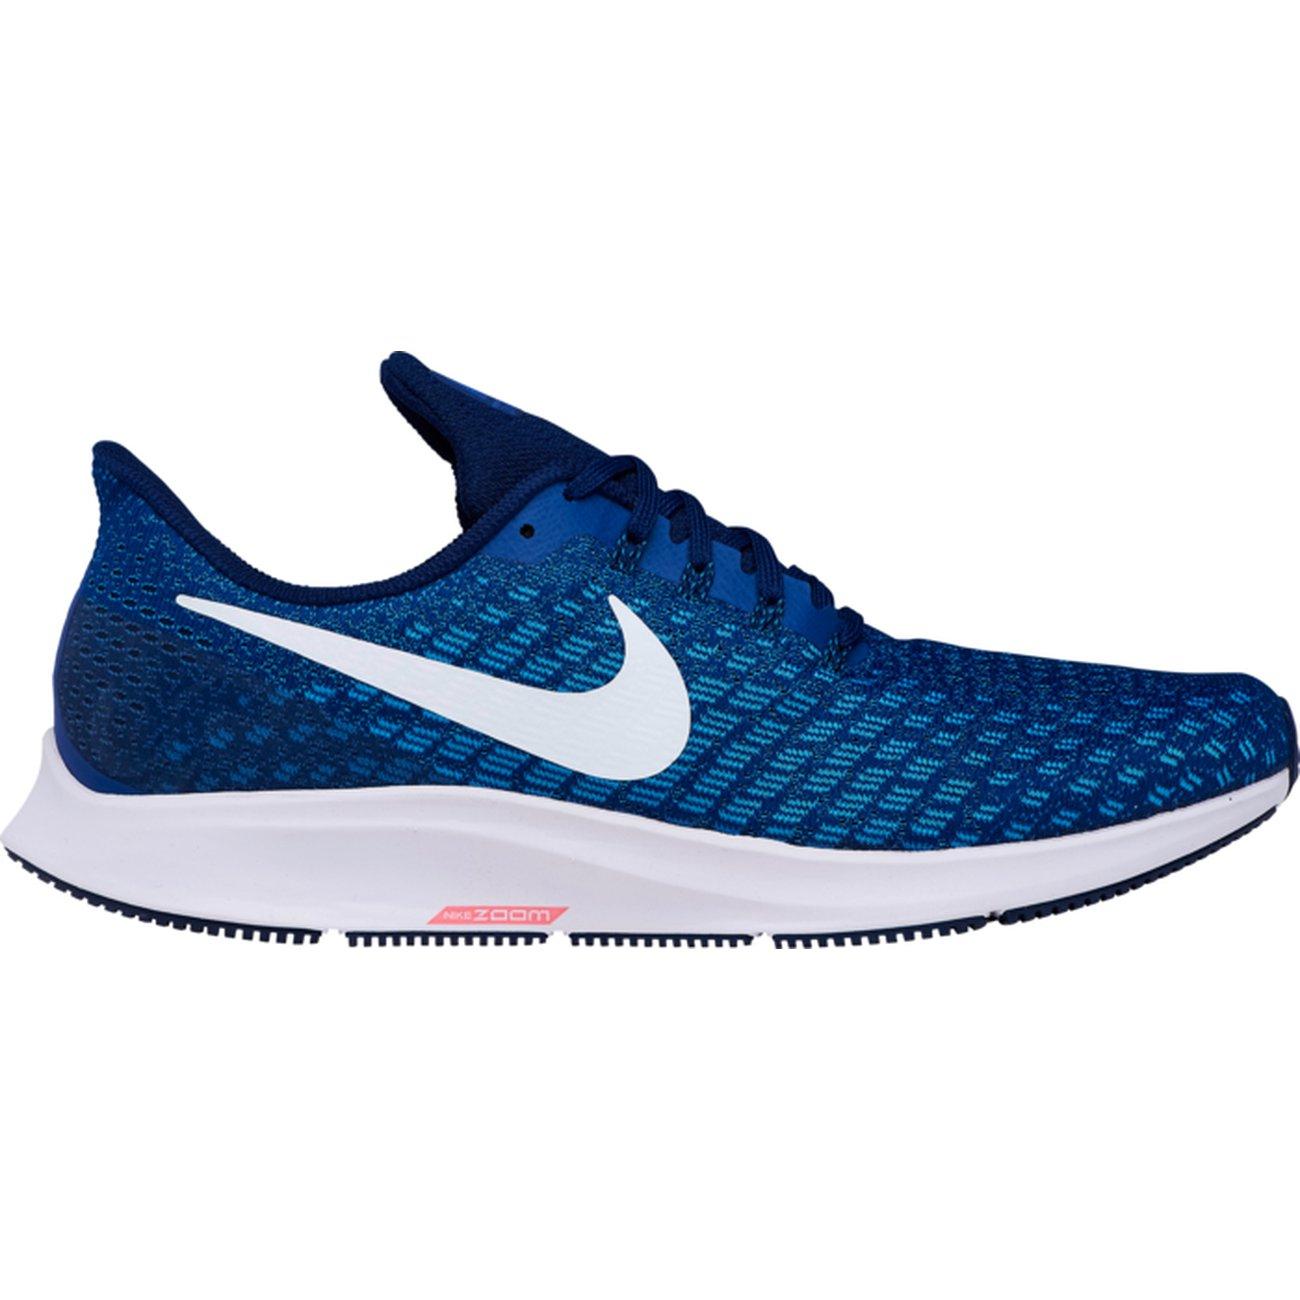 Paire de chaussures Nike AirZoom Pegasus 35 - BLeu, Taille 42